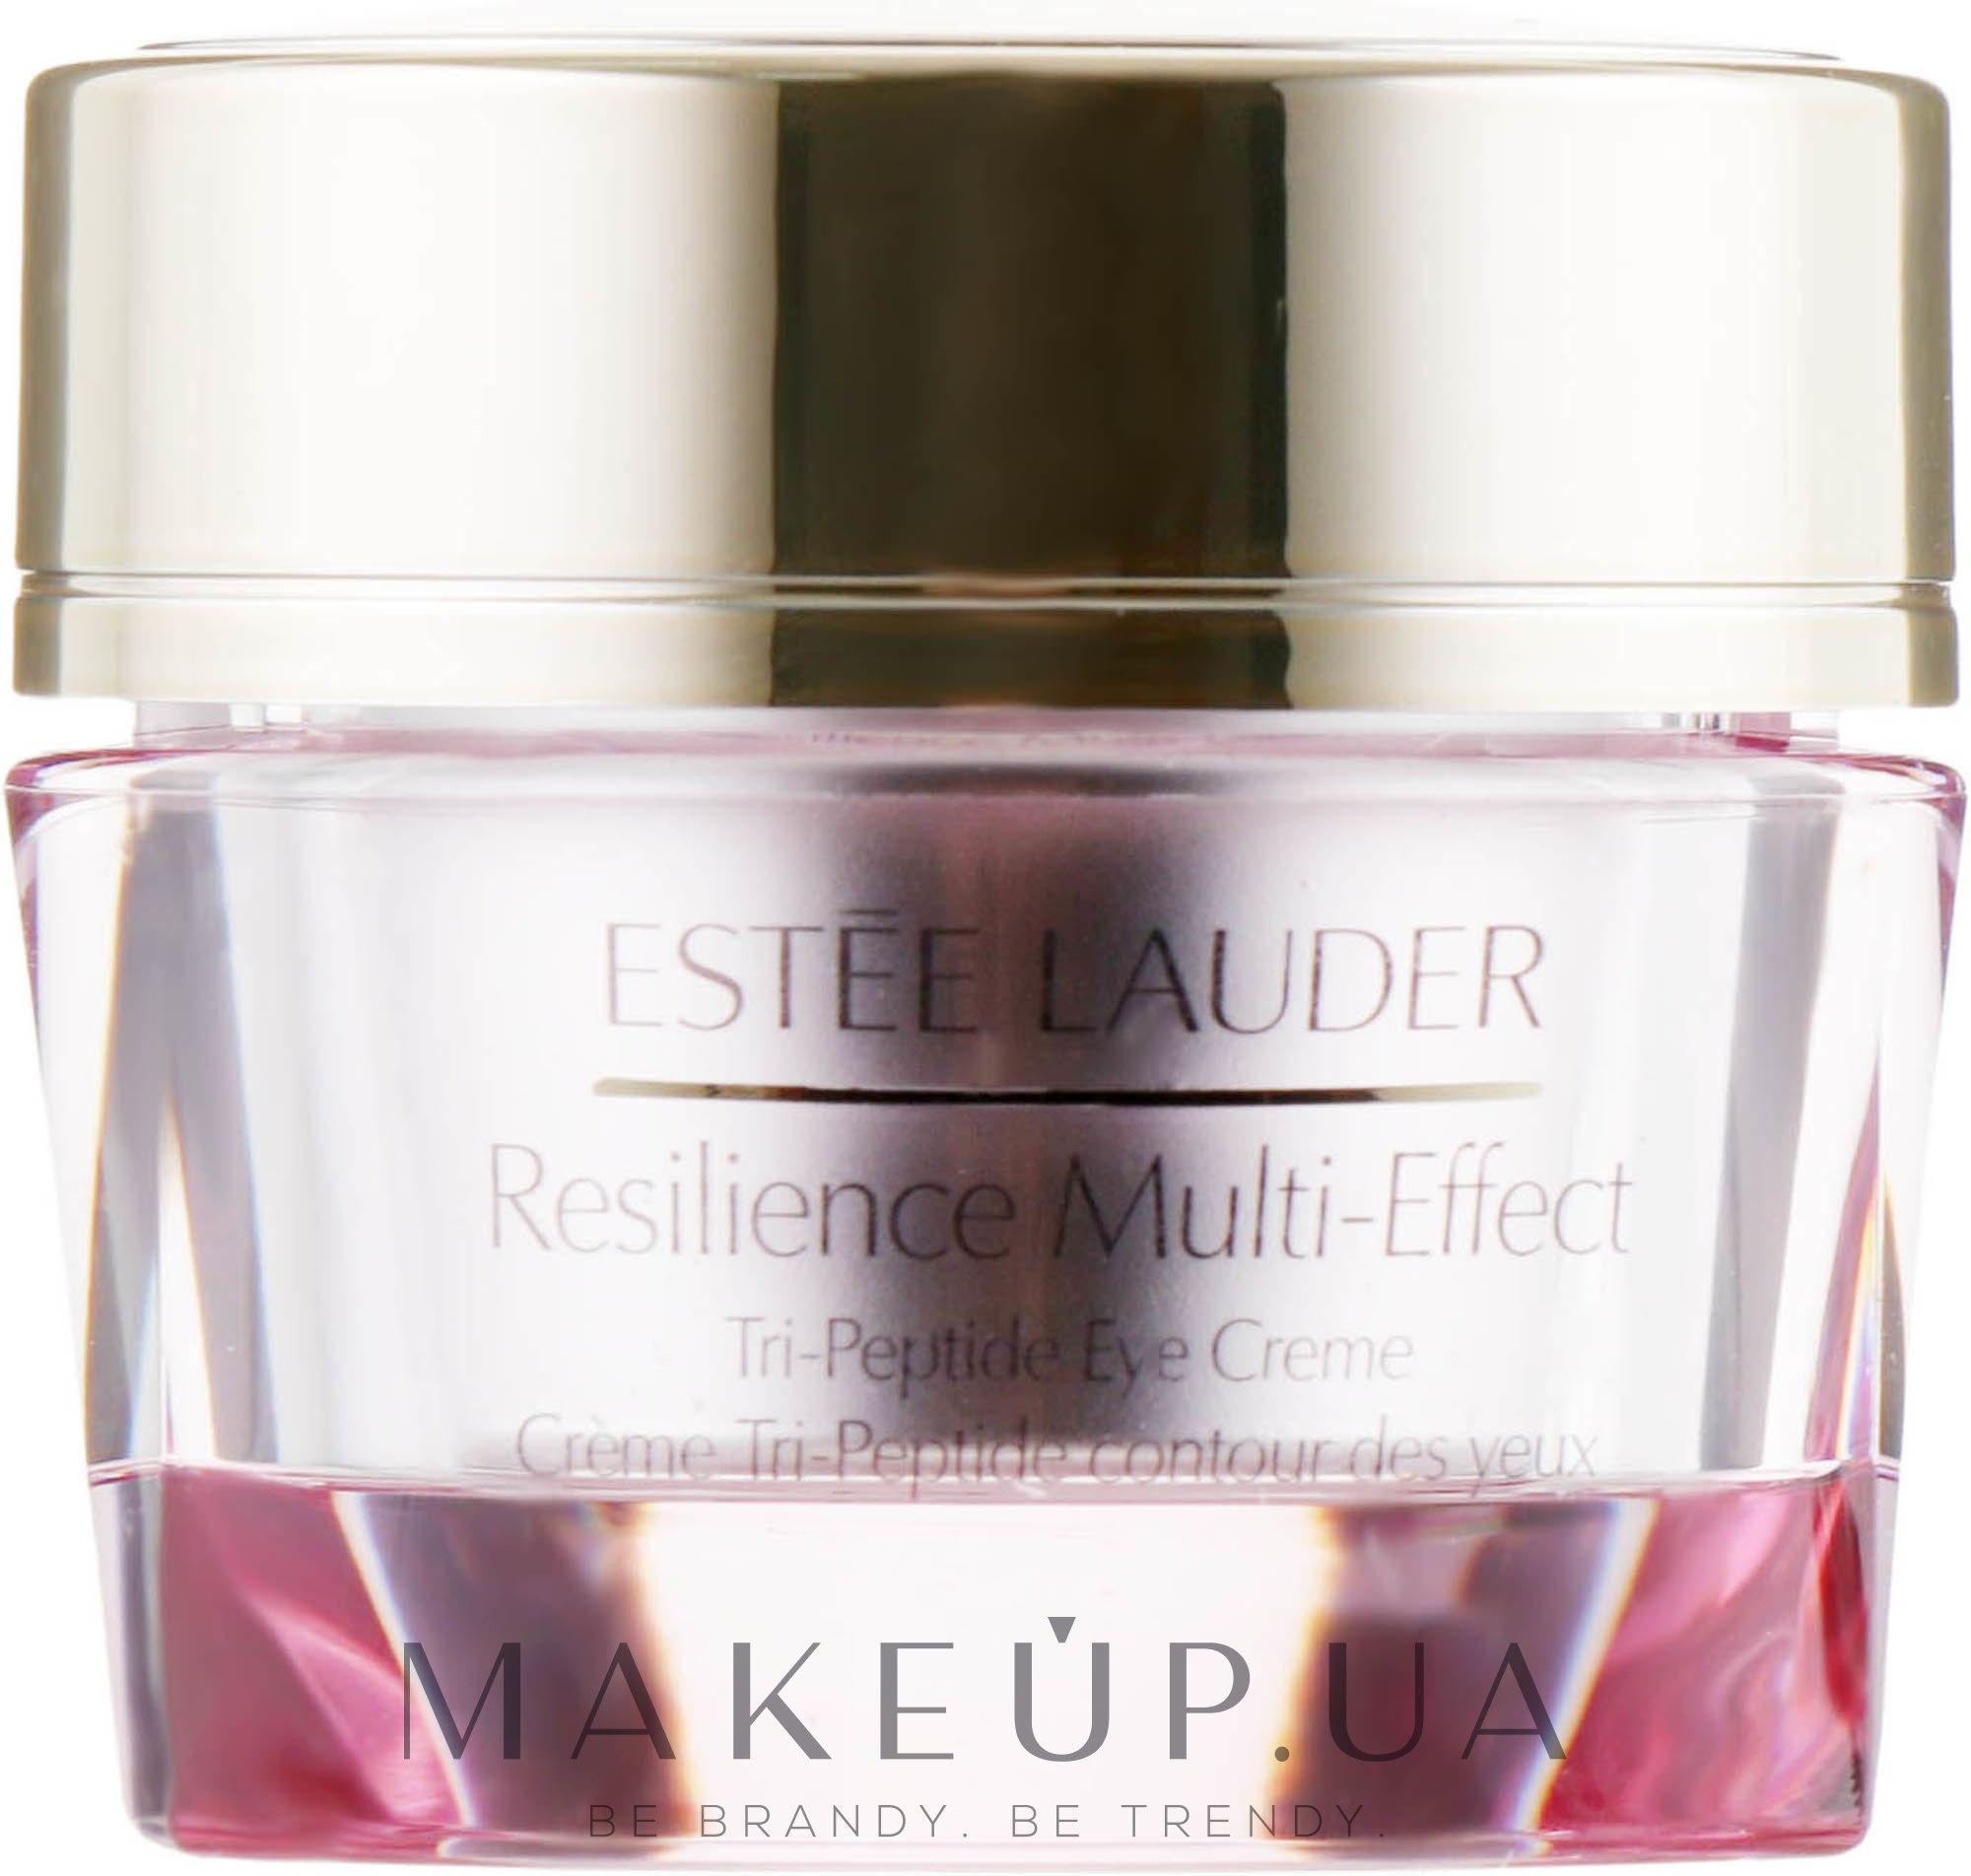 Пептидный крем для век - Estee Lauder Resilience Multi-Effect Tri-Peptide Eye Creme — фото 15ml